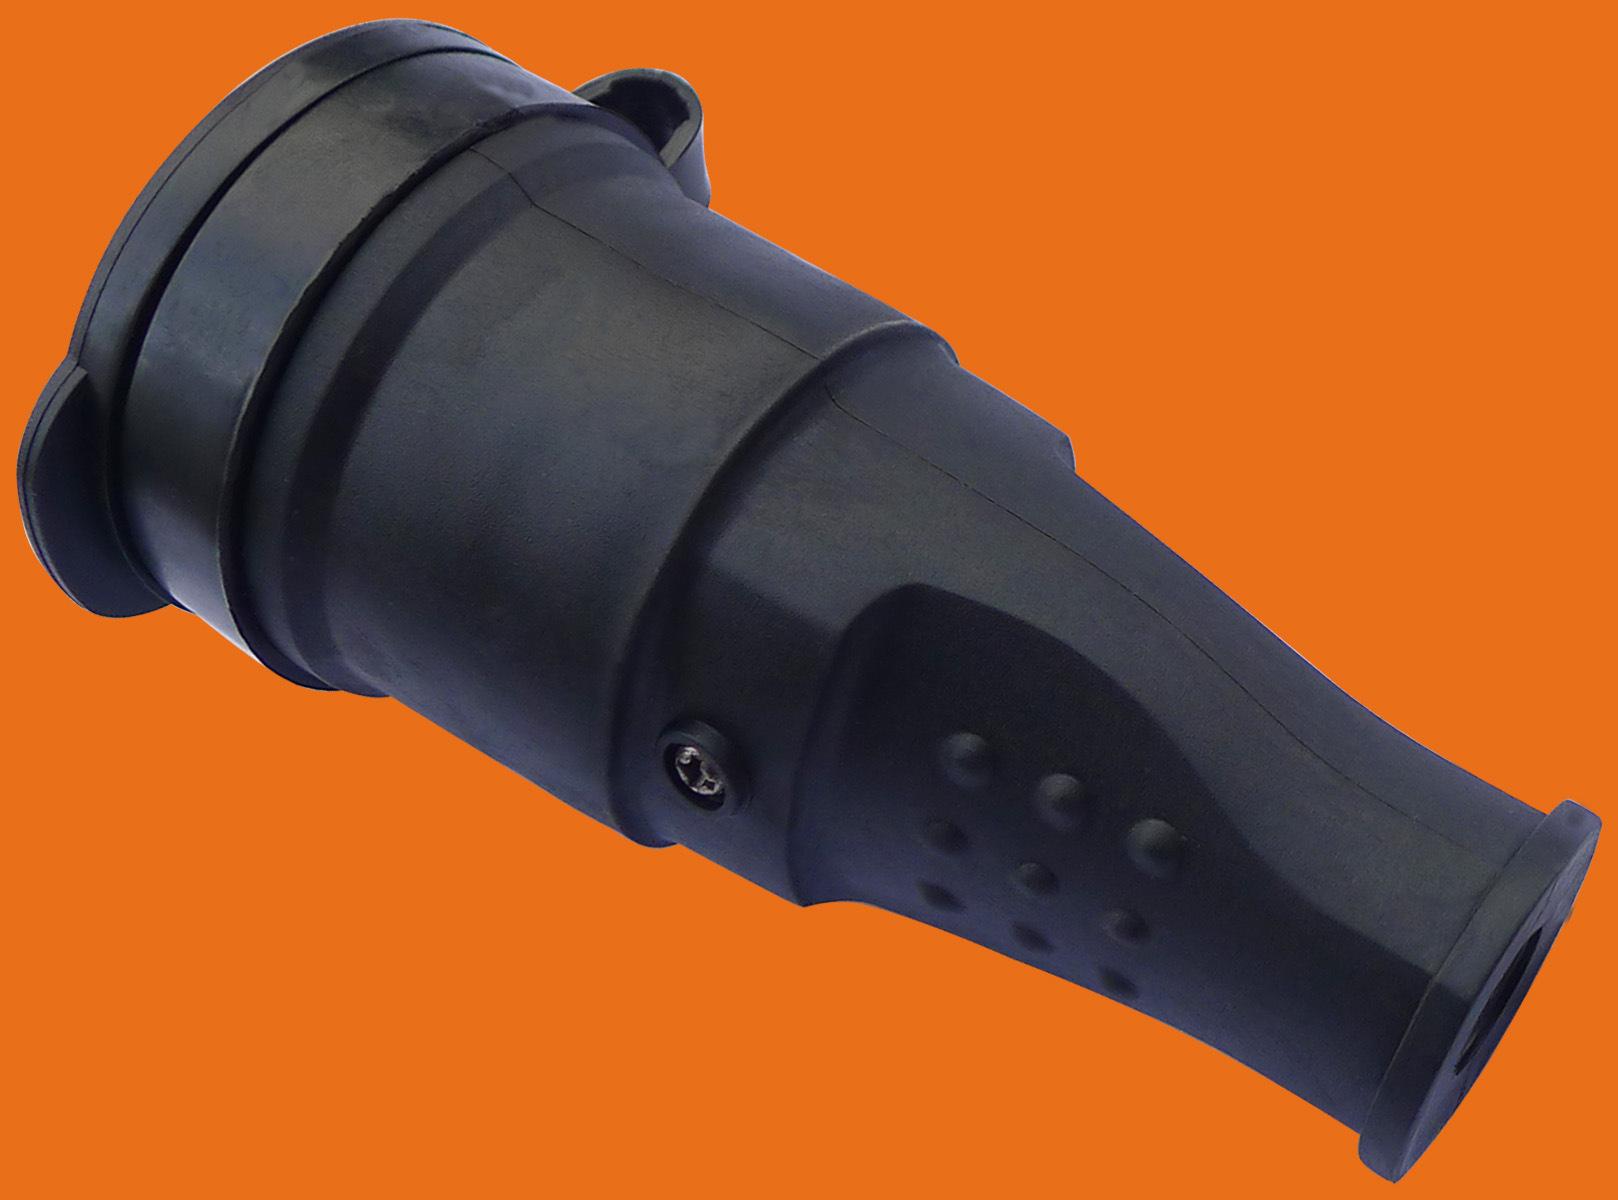 Elendax IP44 Grade Professional 16A/250V Schuko Rubber Industrial Plug/Rubber Connector/Rubber Schuko Plug and Socket (P6061)